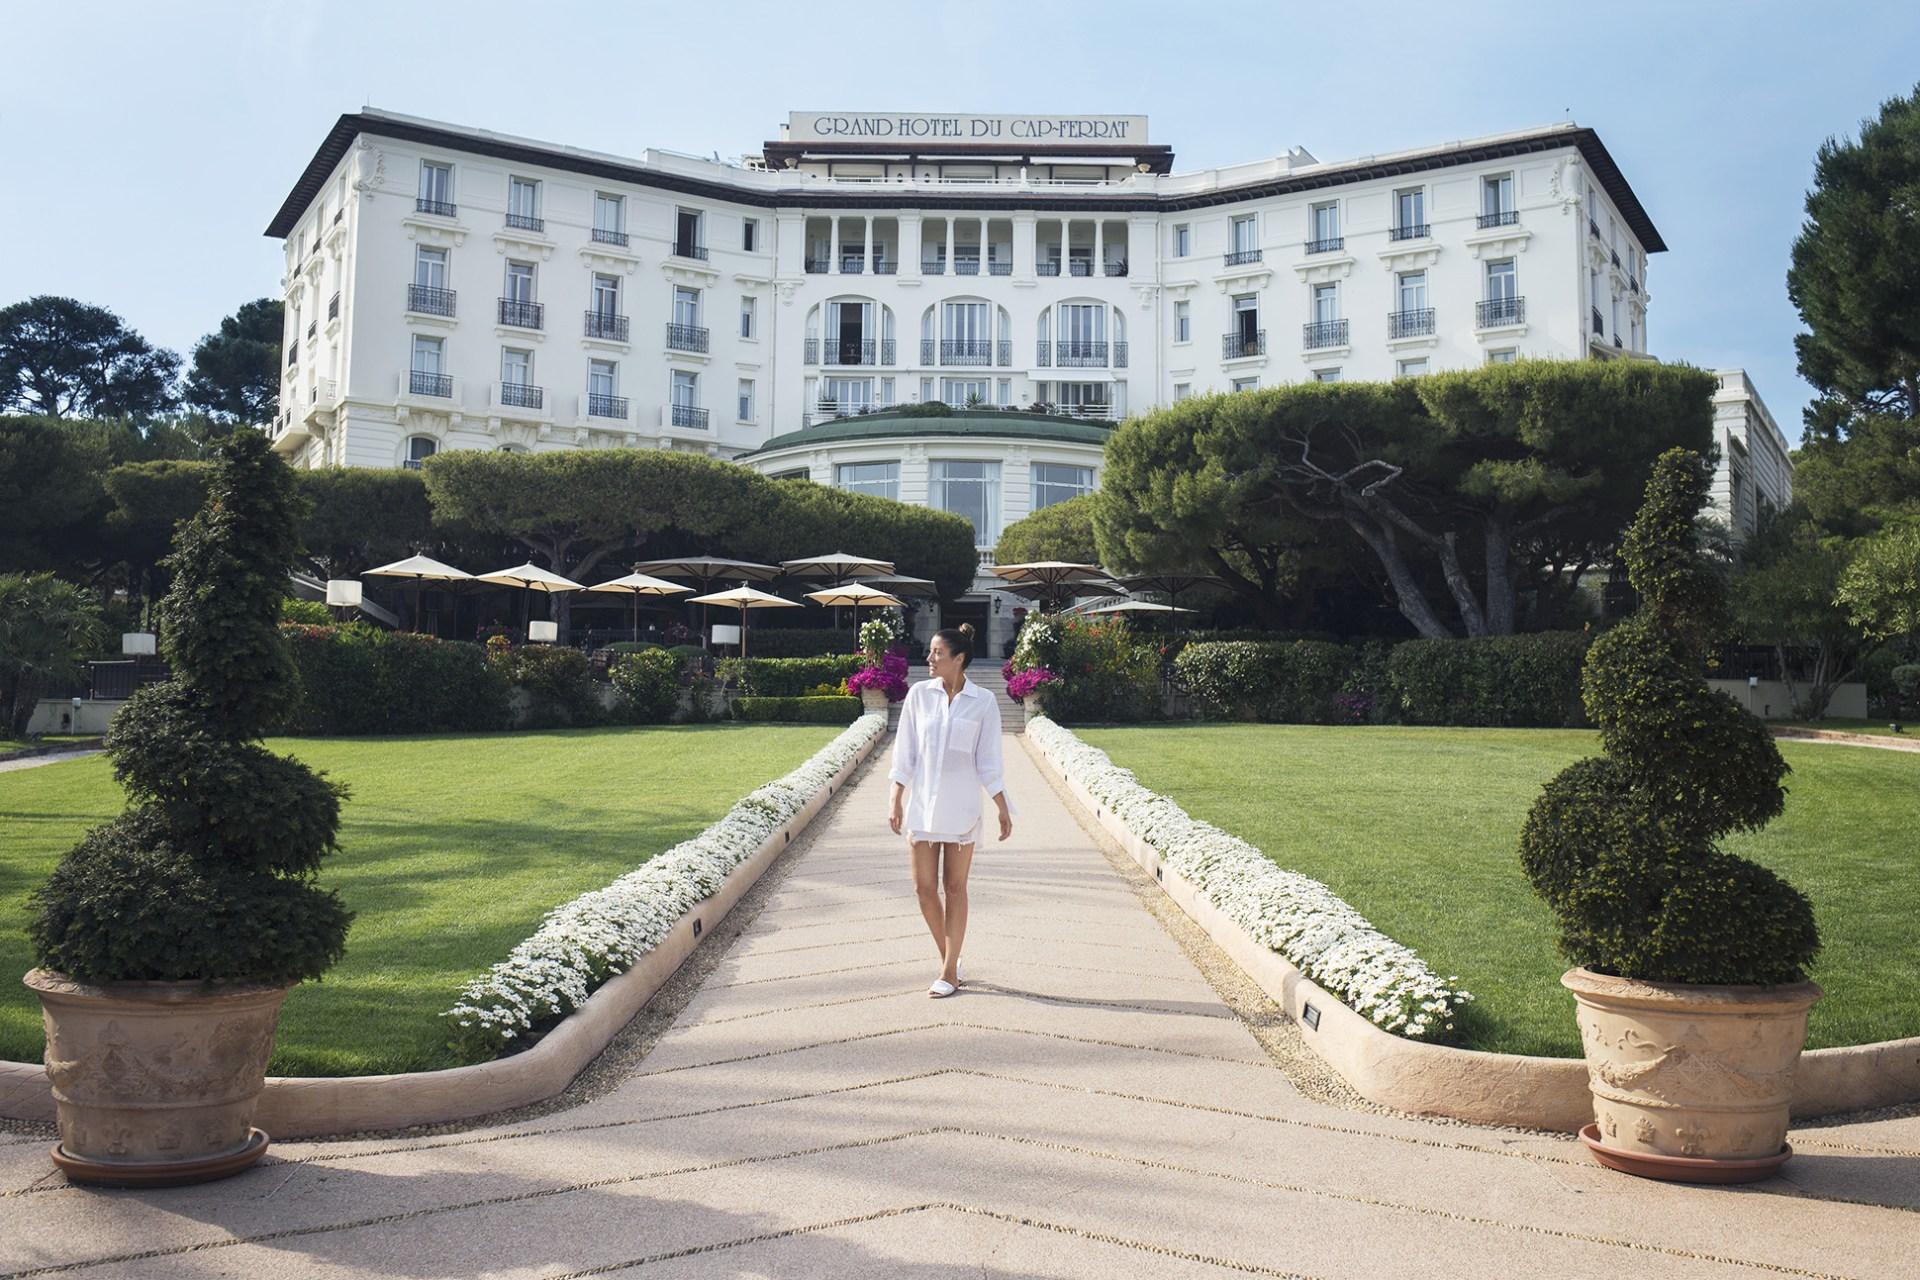 Grand-Hotel du Cap-Ferrat a Four Seasons Hotel